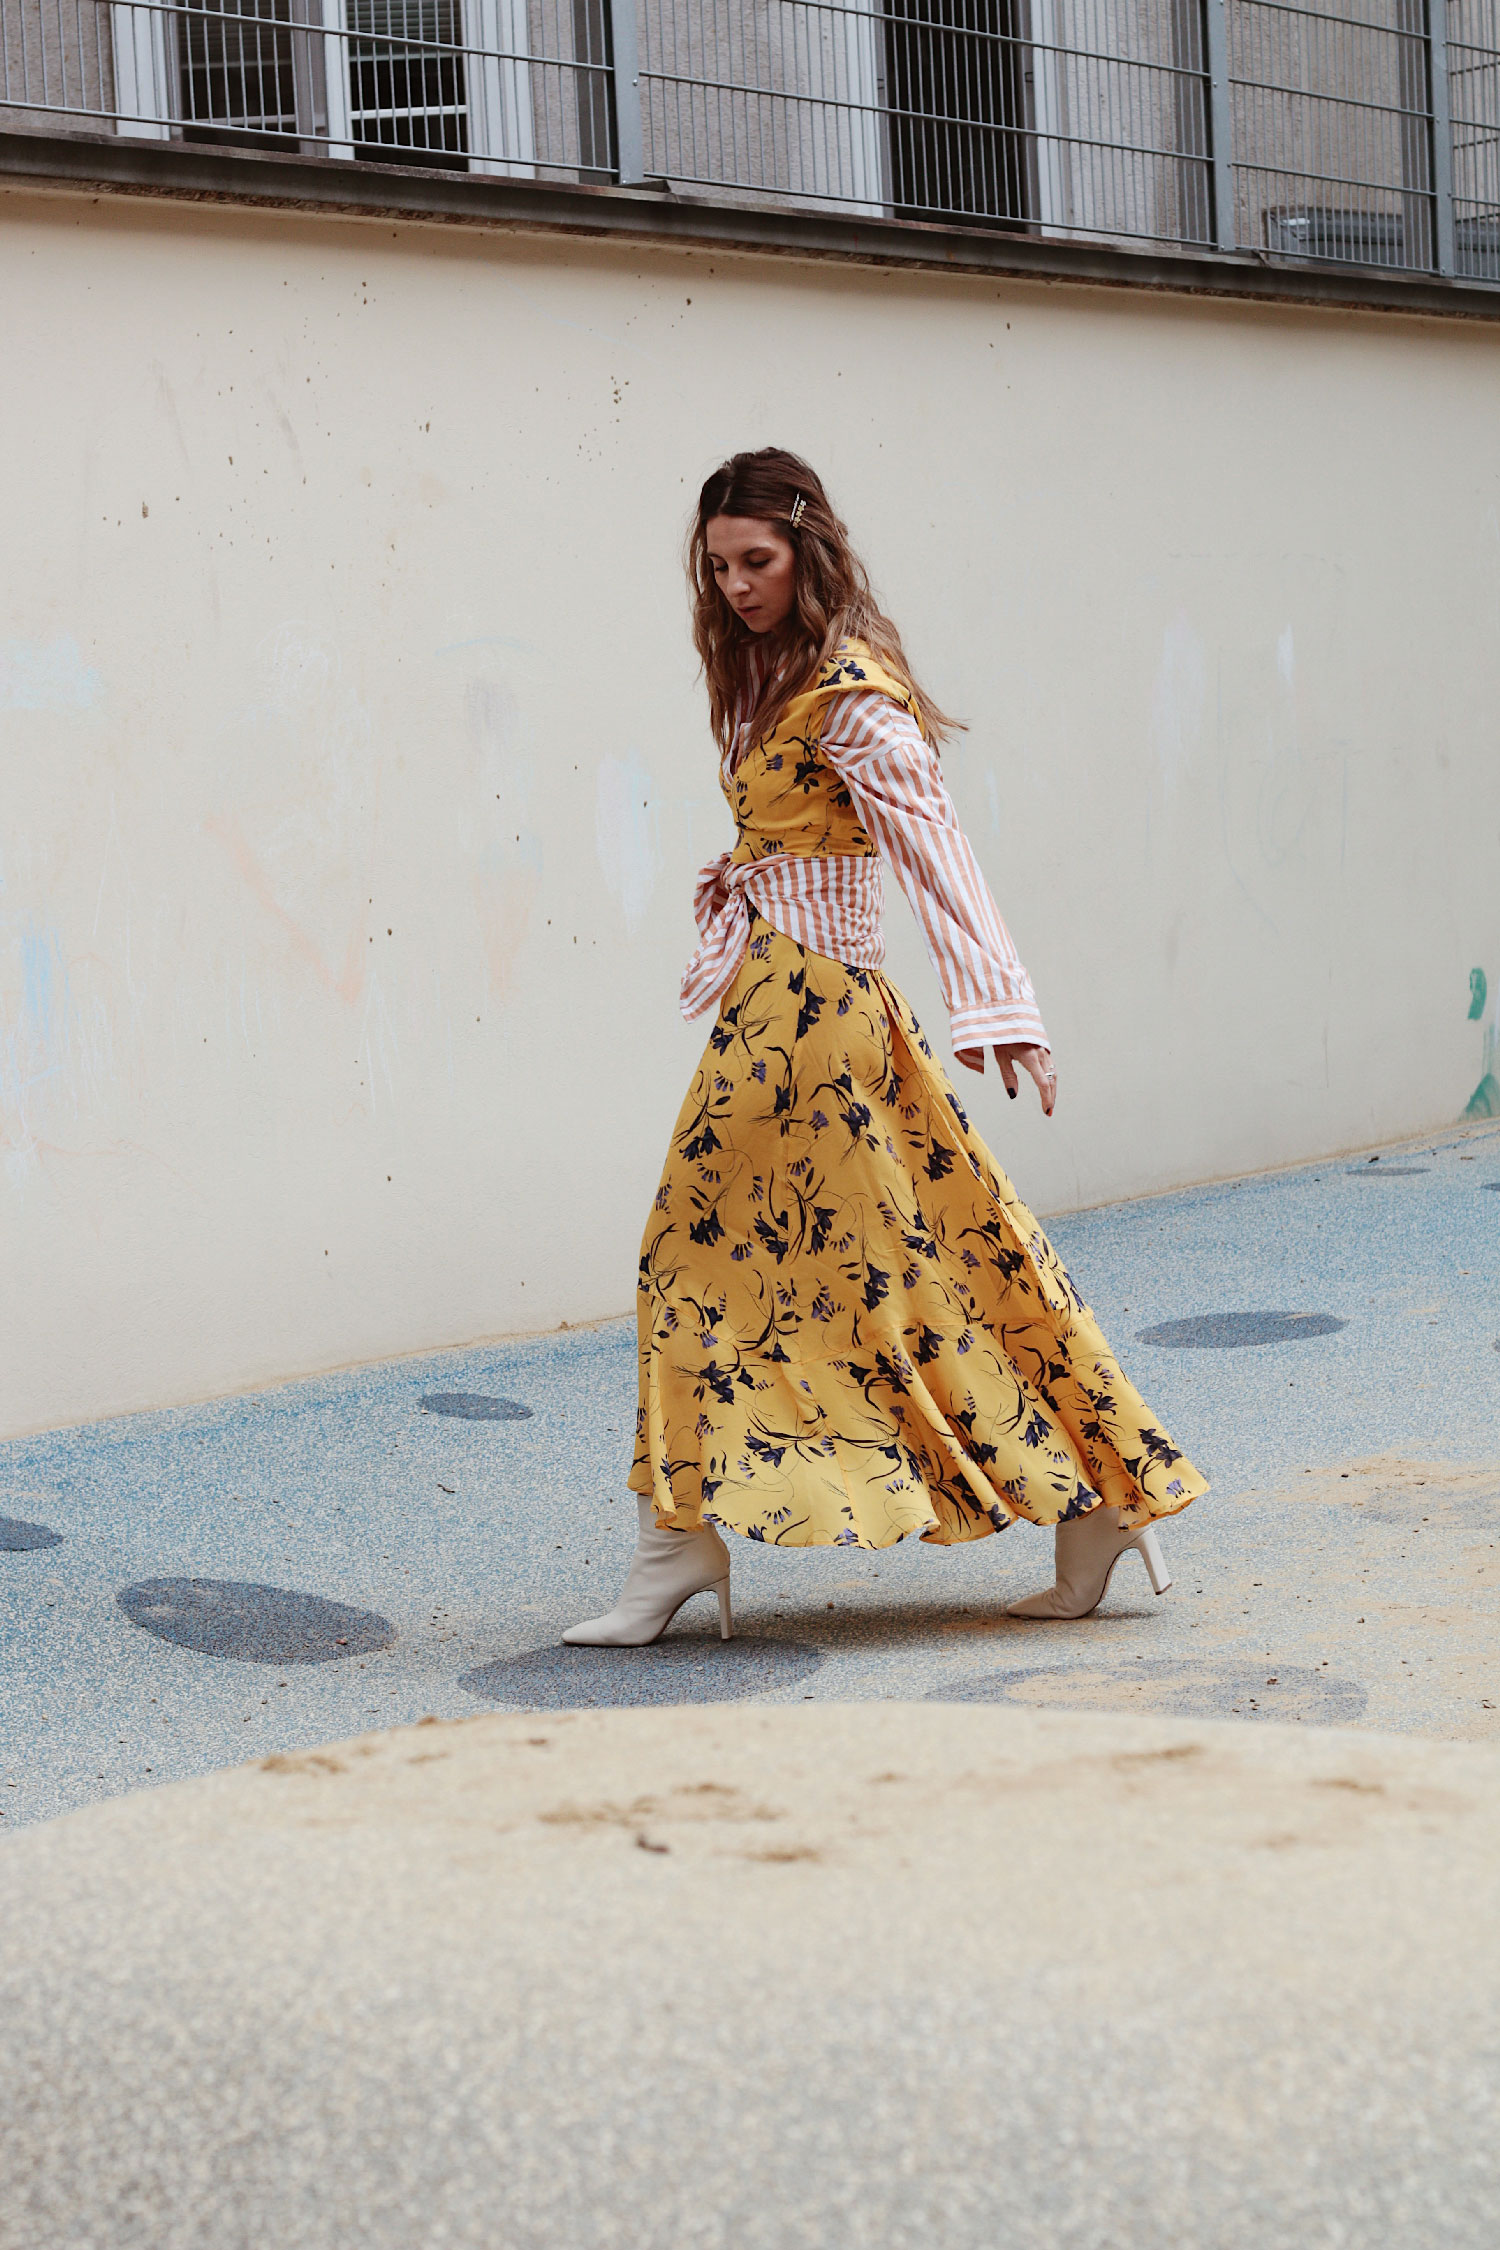 Kleider Trends 2019 - www.lesfactoryfemmes.com